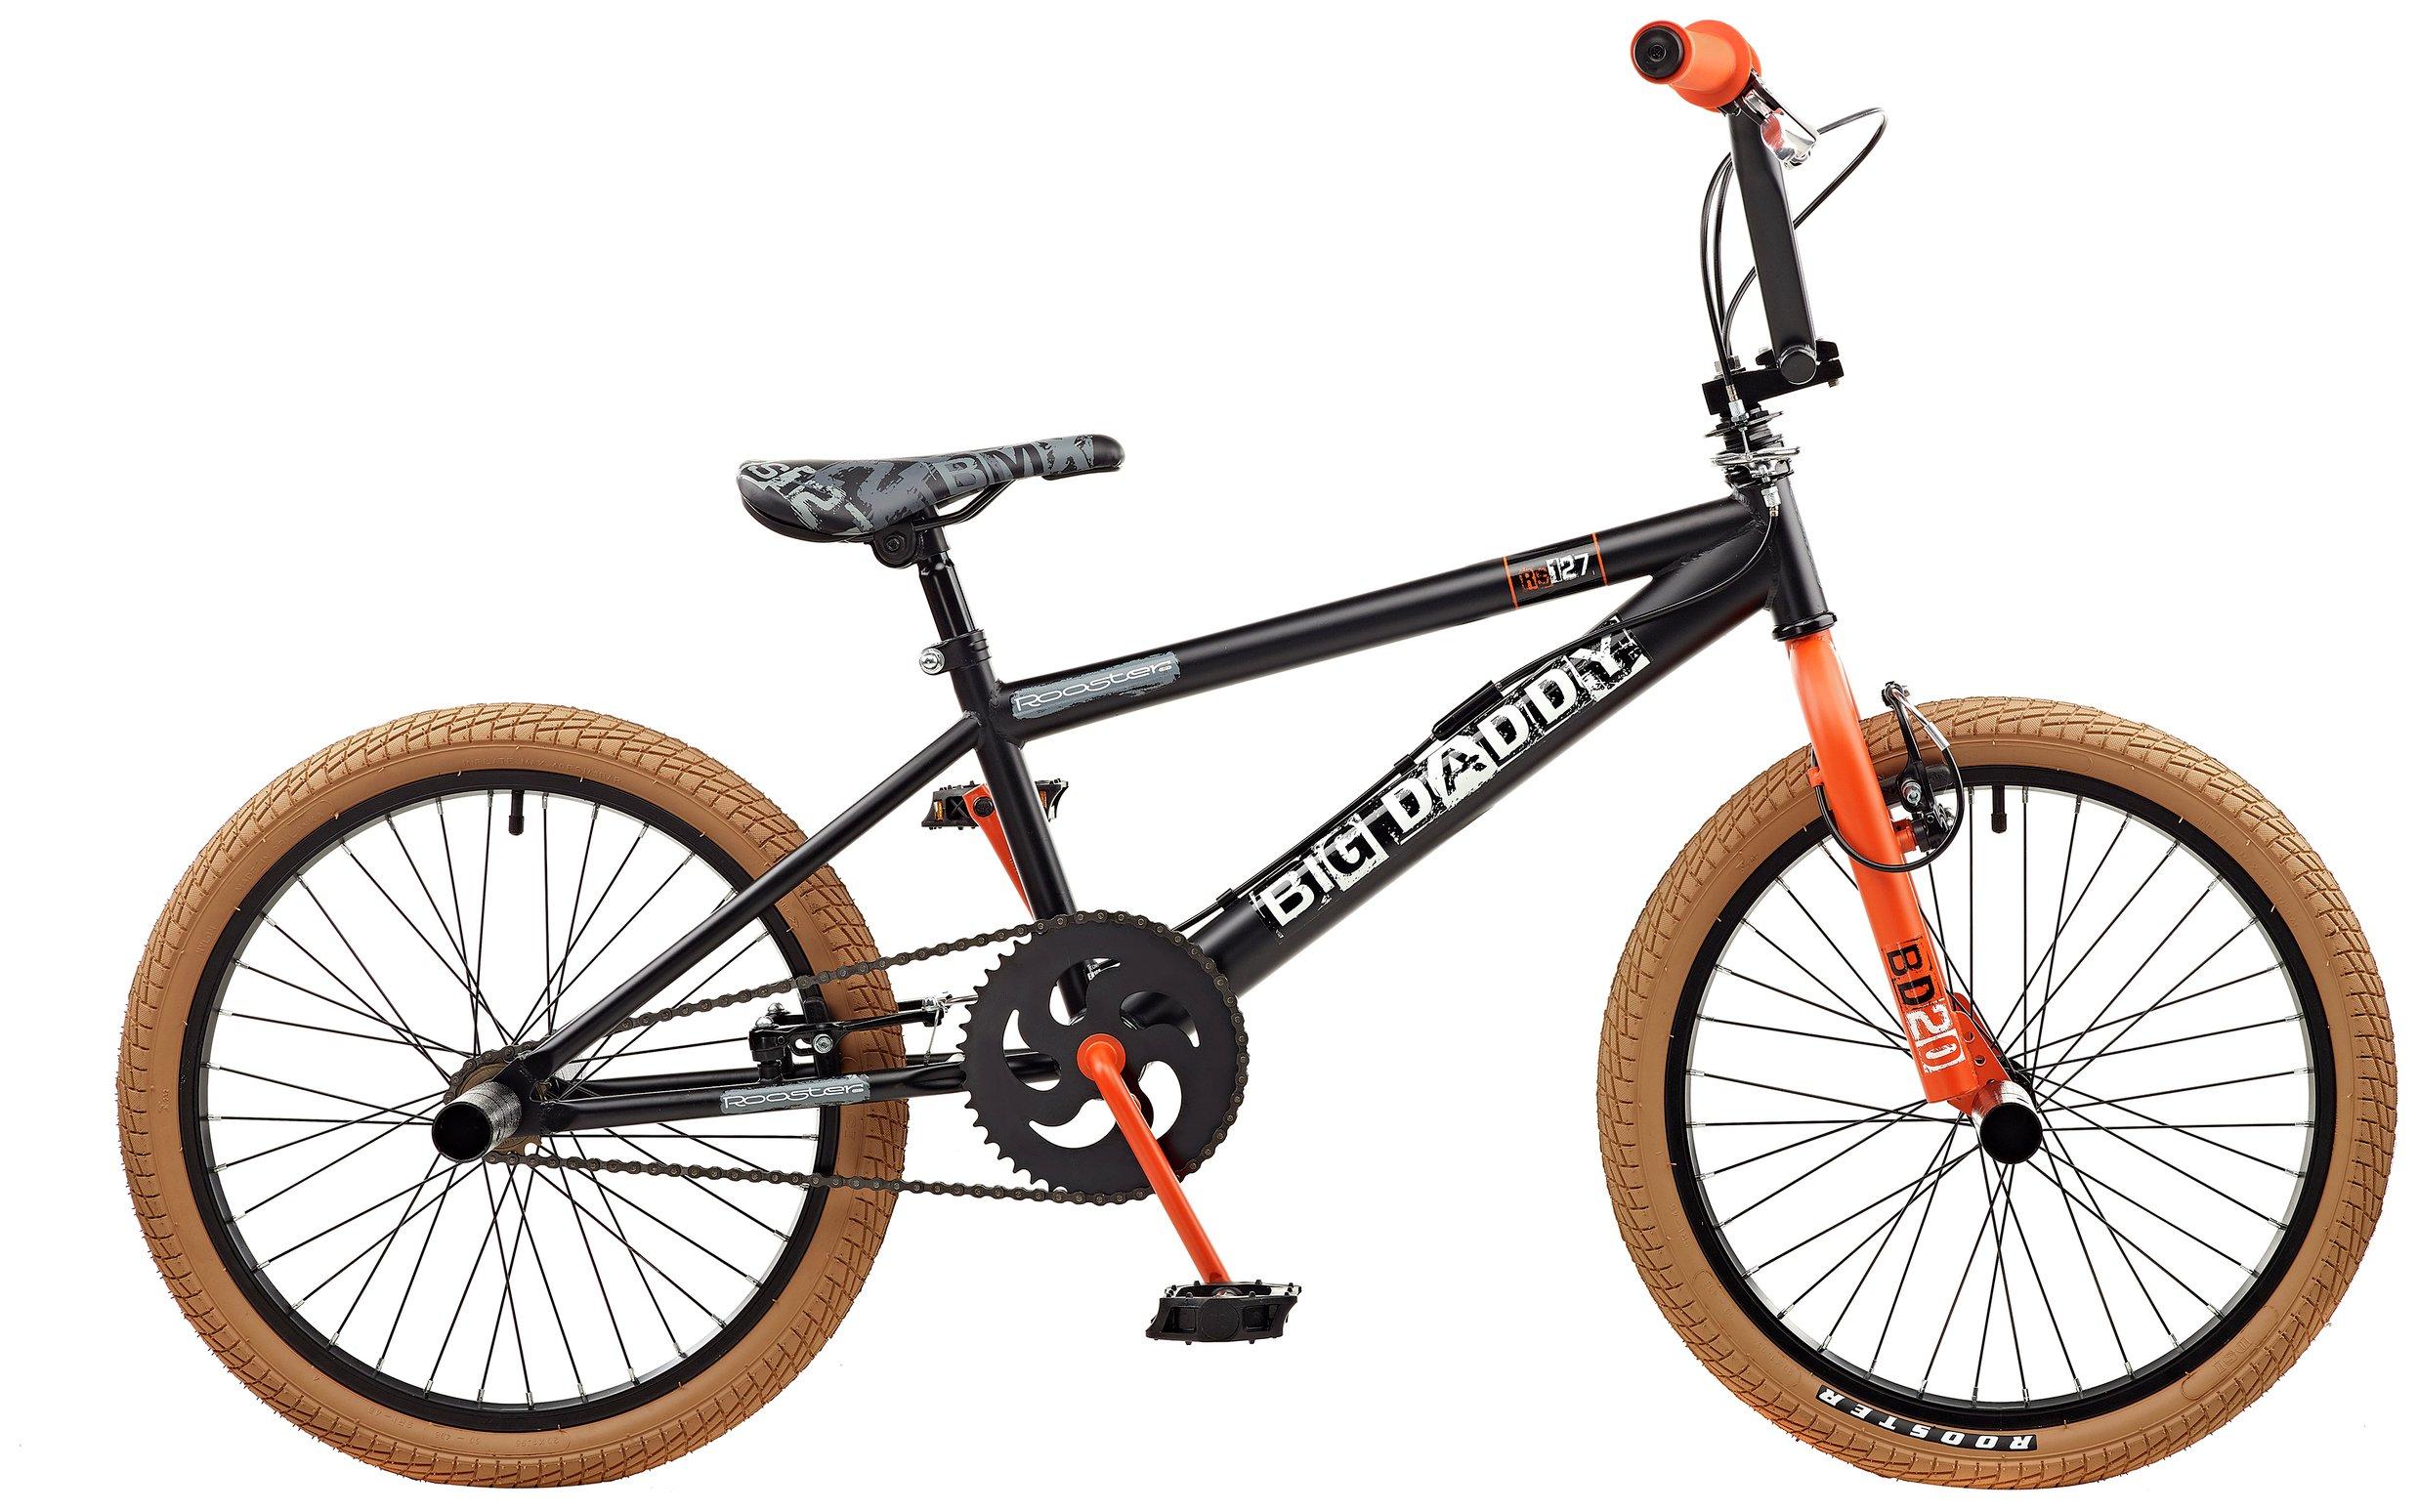 'Rooster Big Daddy 20 Bmx Bike - Black & Orange